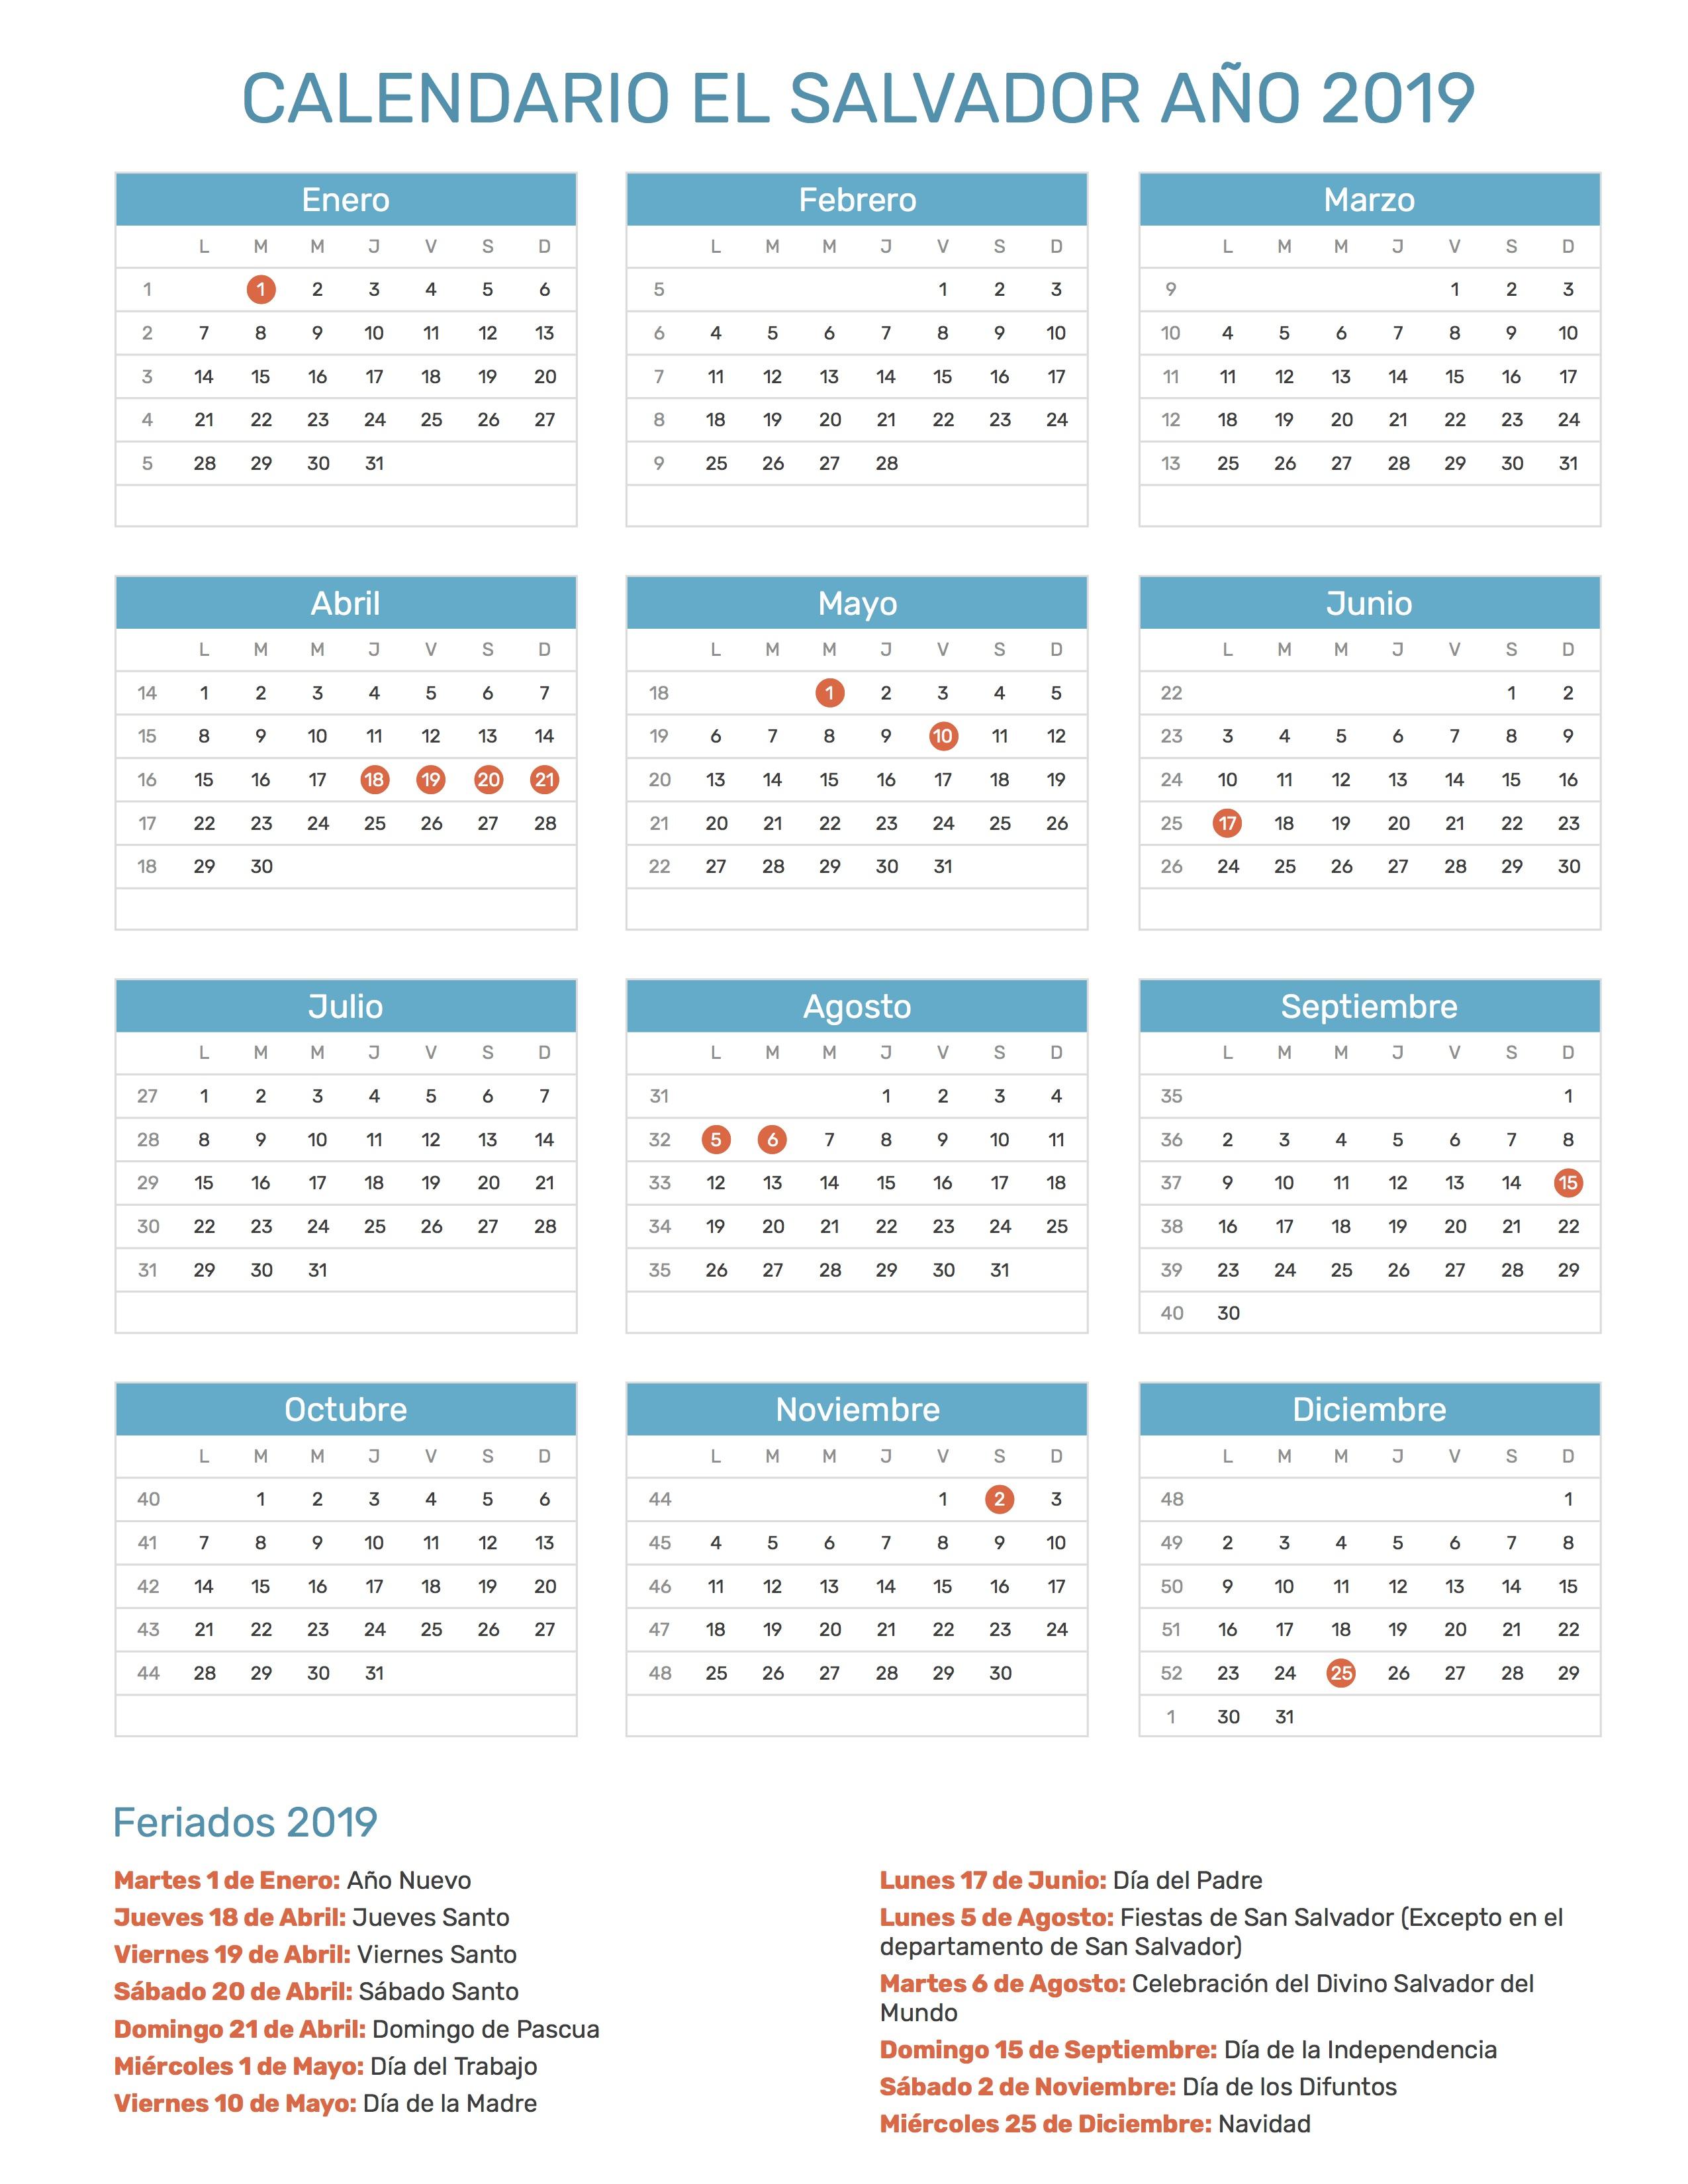 Calendario Agosto 2019 Con Feriados.Calendario De El Salvador Ano 2019 Feriados